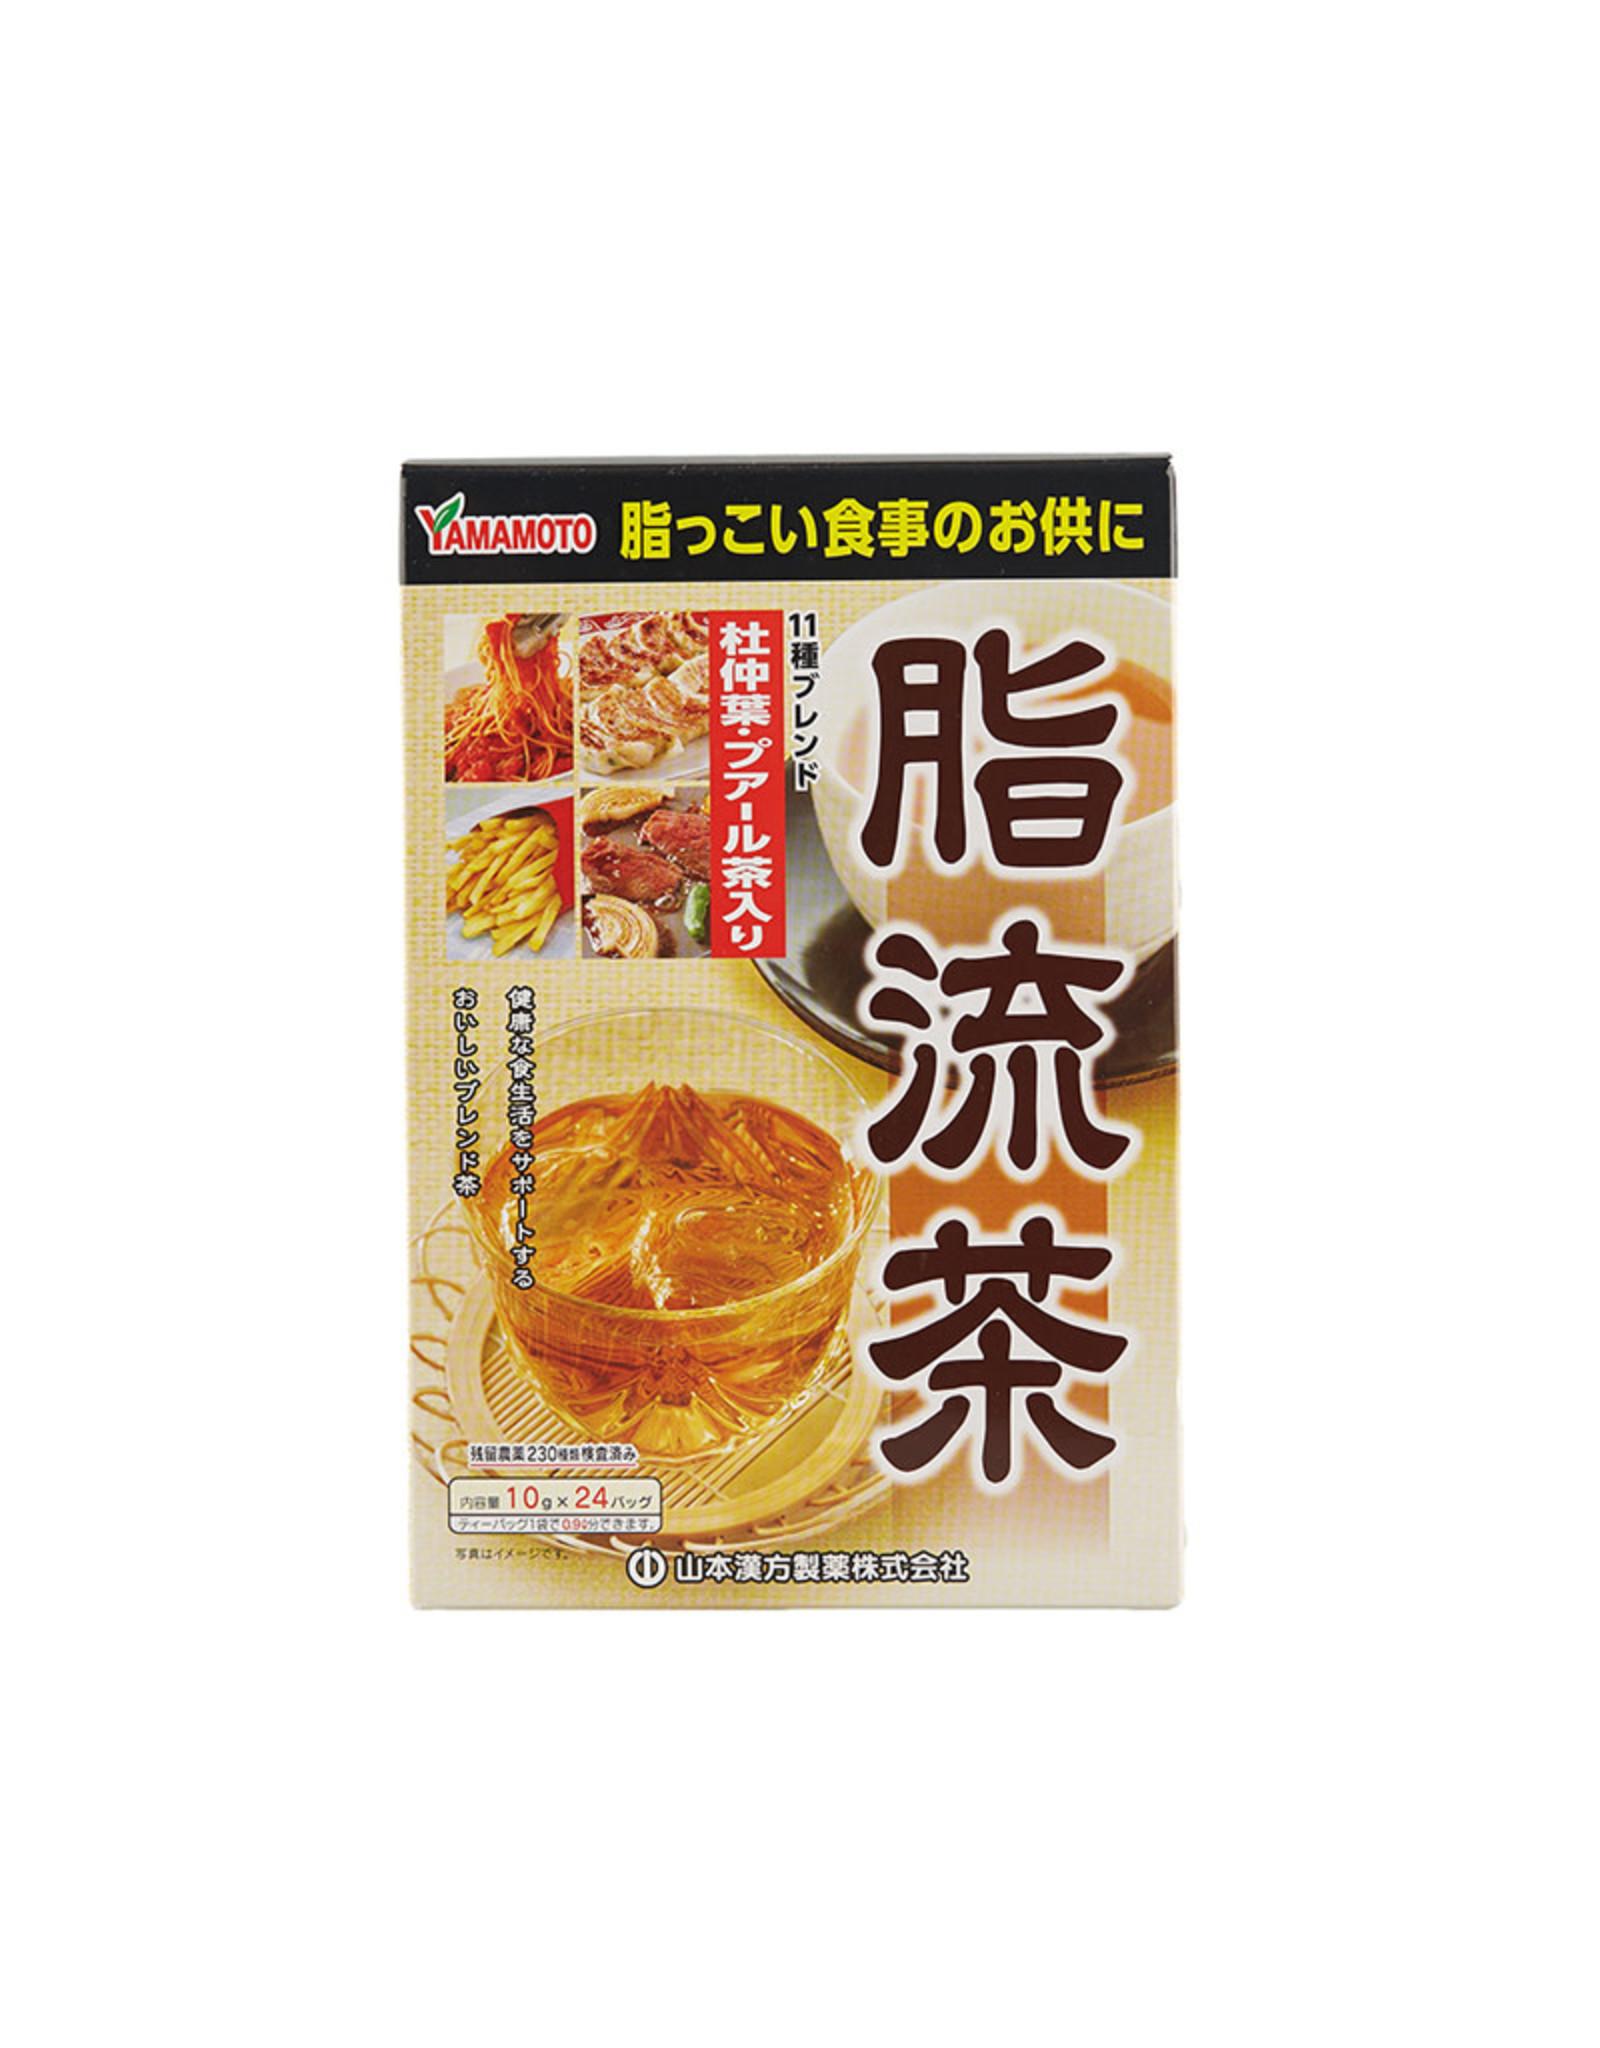 Yamamoto Yamamoto Mixed Herbal Tea Fat Flow (Shiryu Cha) 10G X 24 Bags